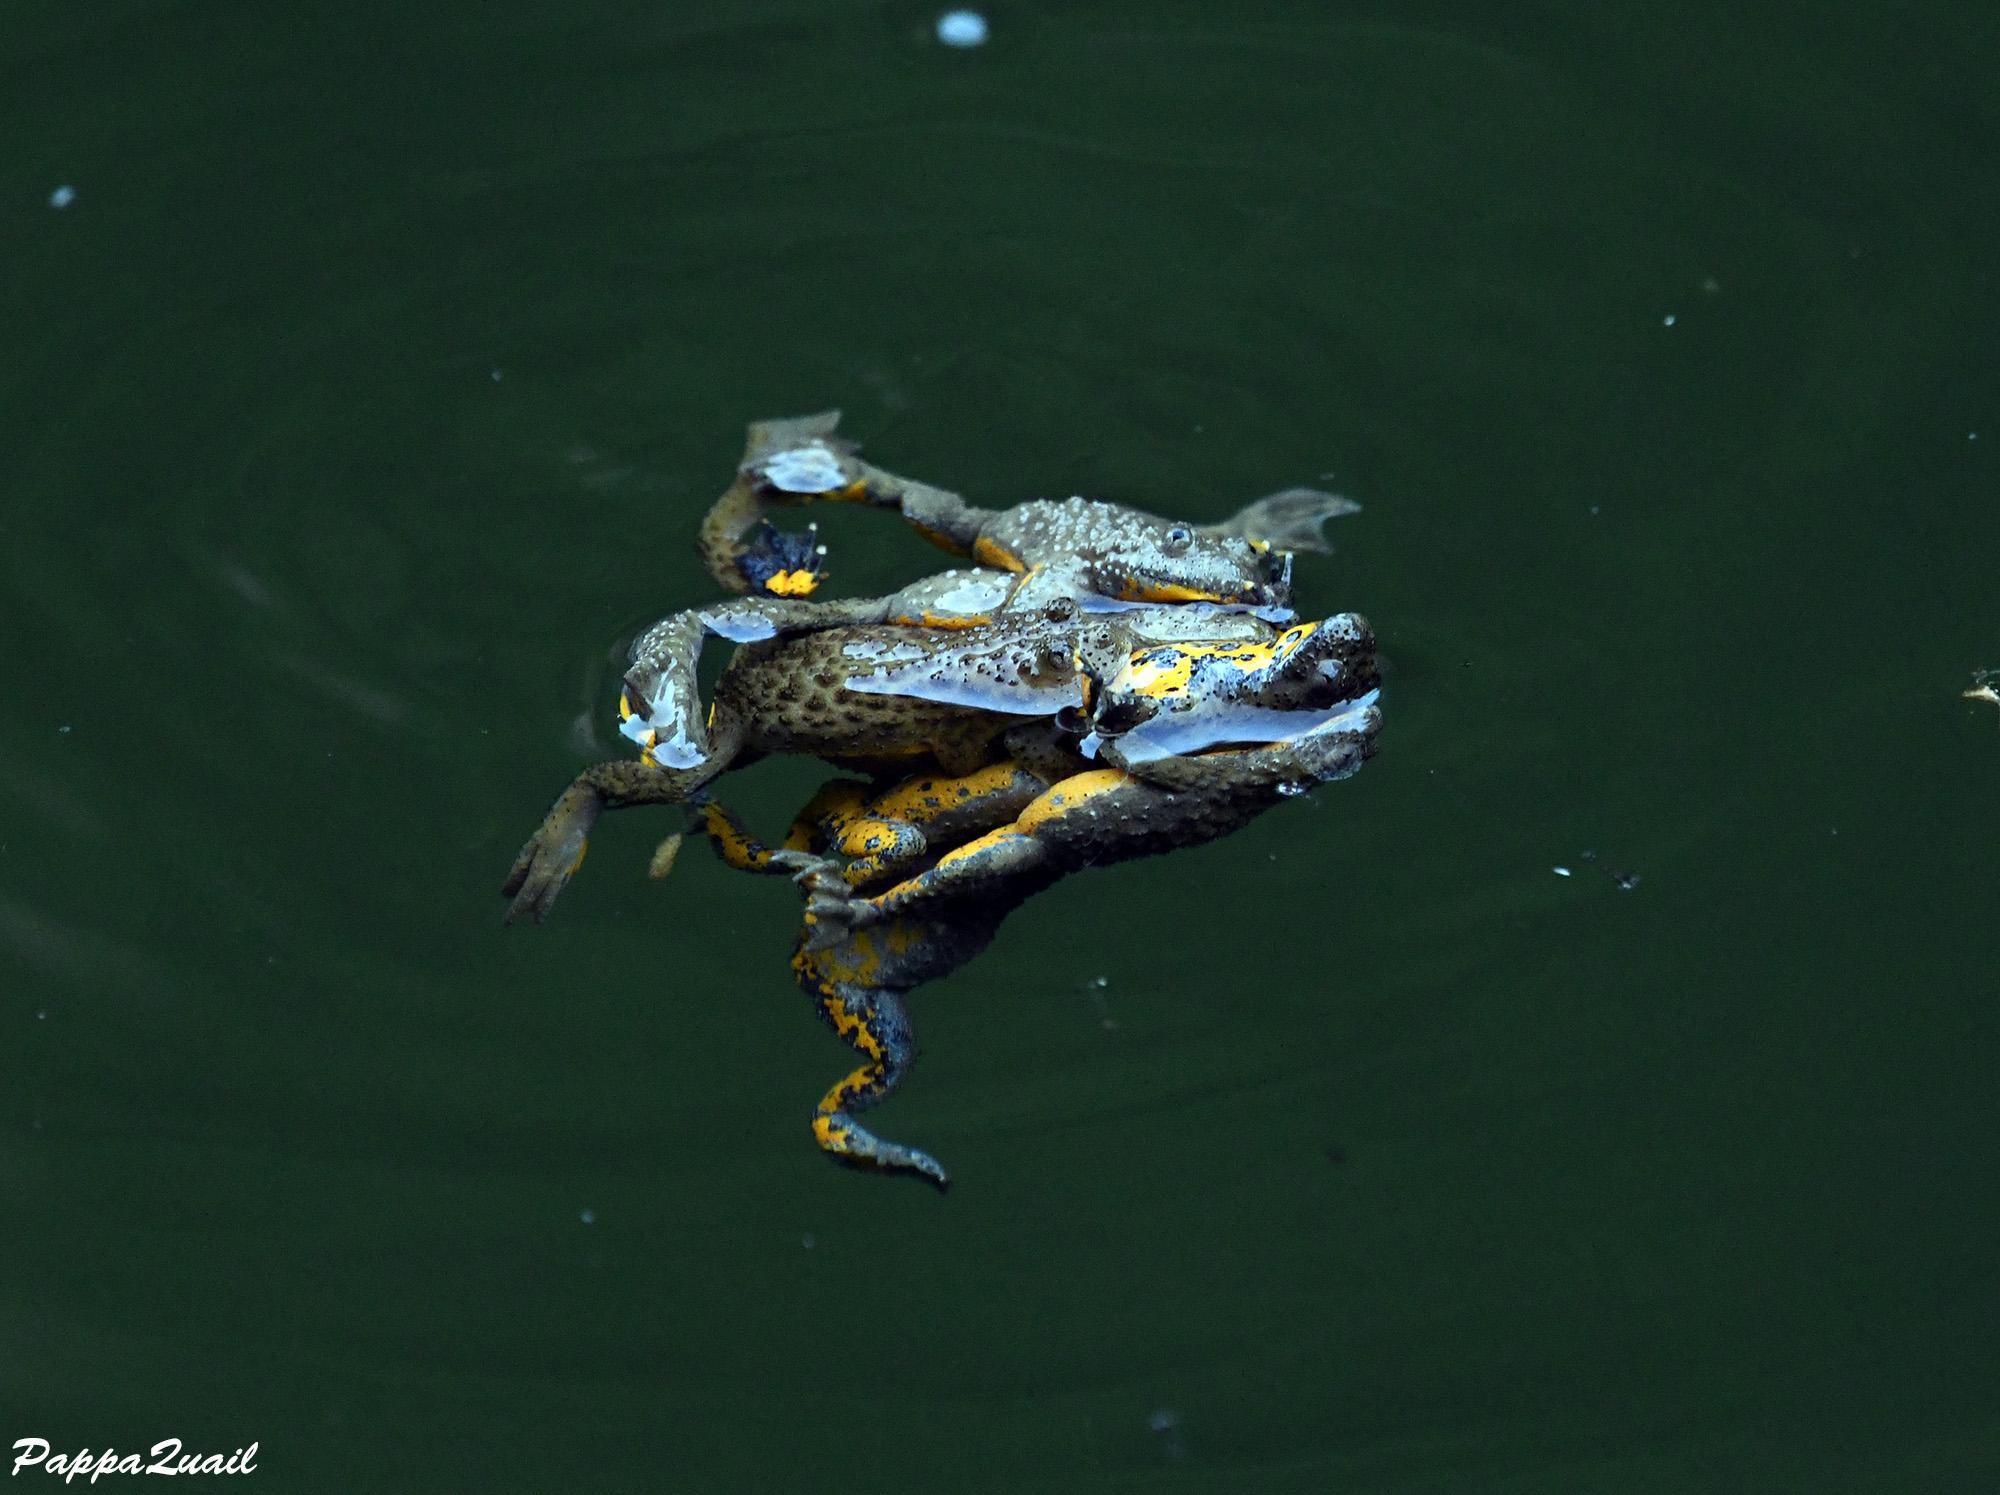 Yellow-bellied Toad - Bombina variegata